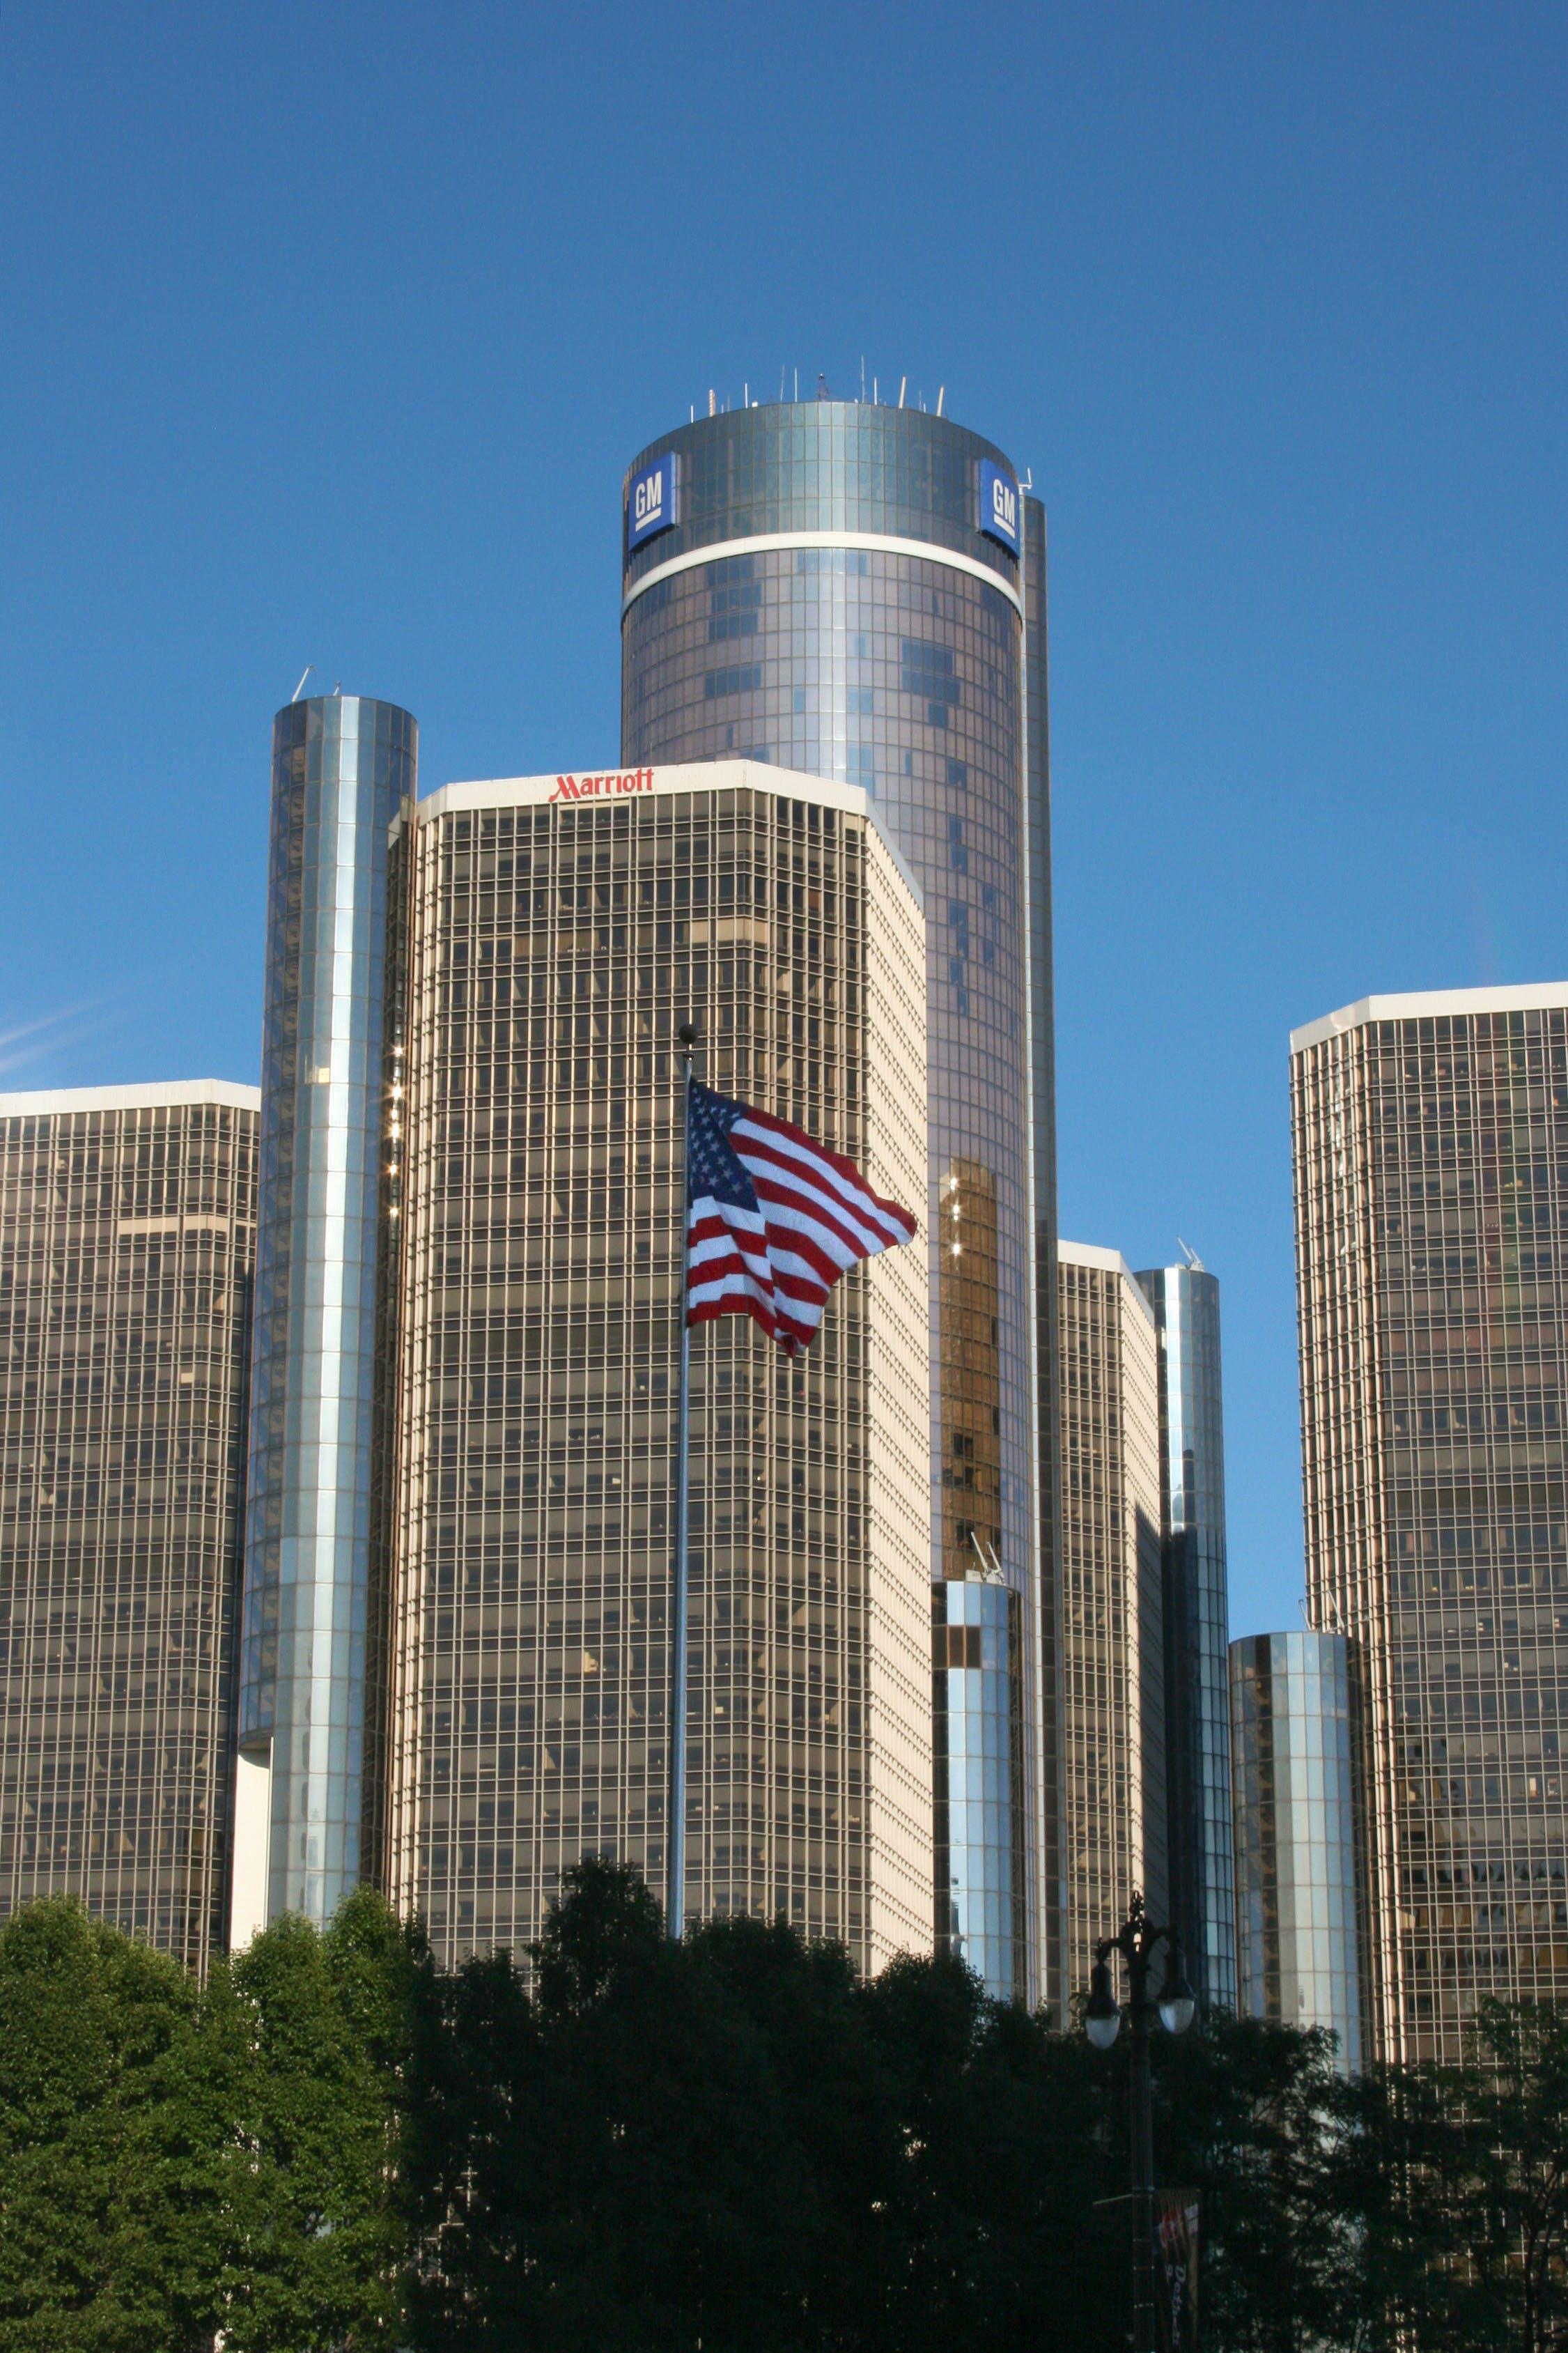 gm headquarters, office building, skyscraper